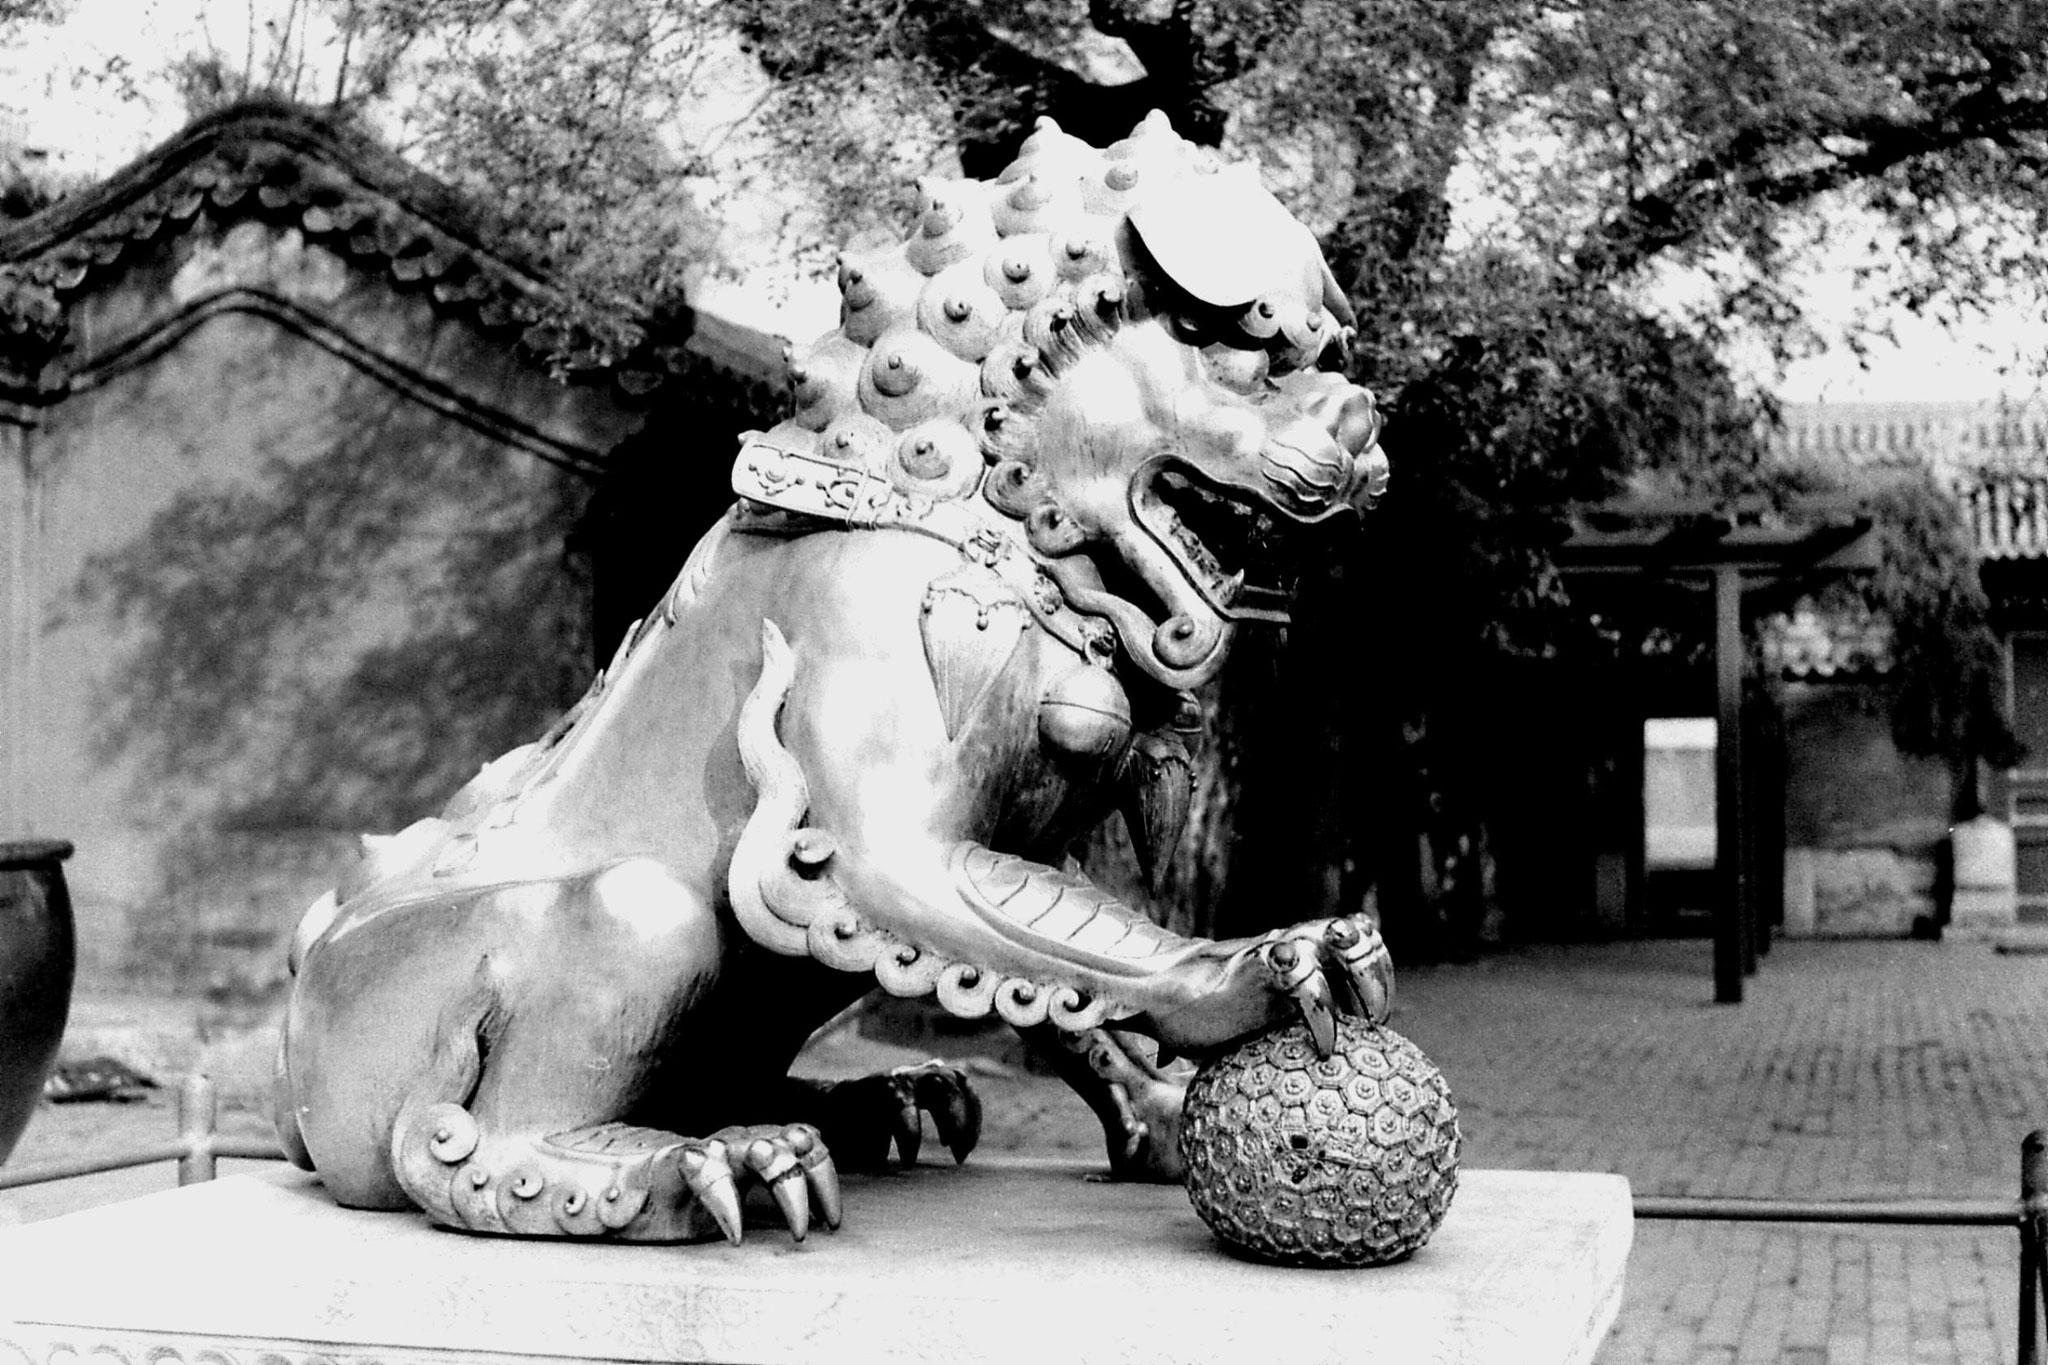 30/10/1988: 3: bronze lion